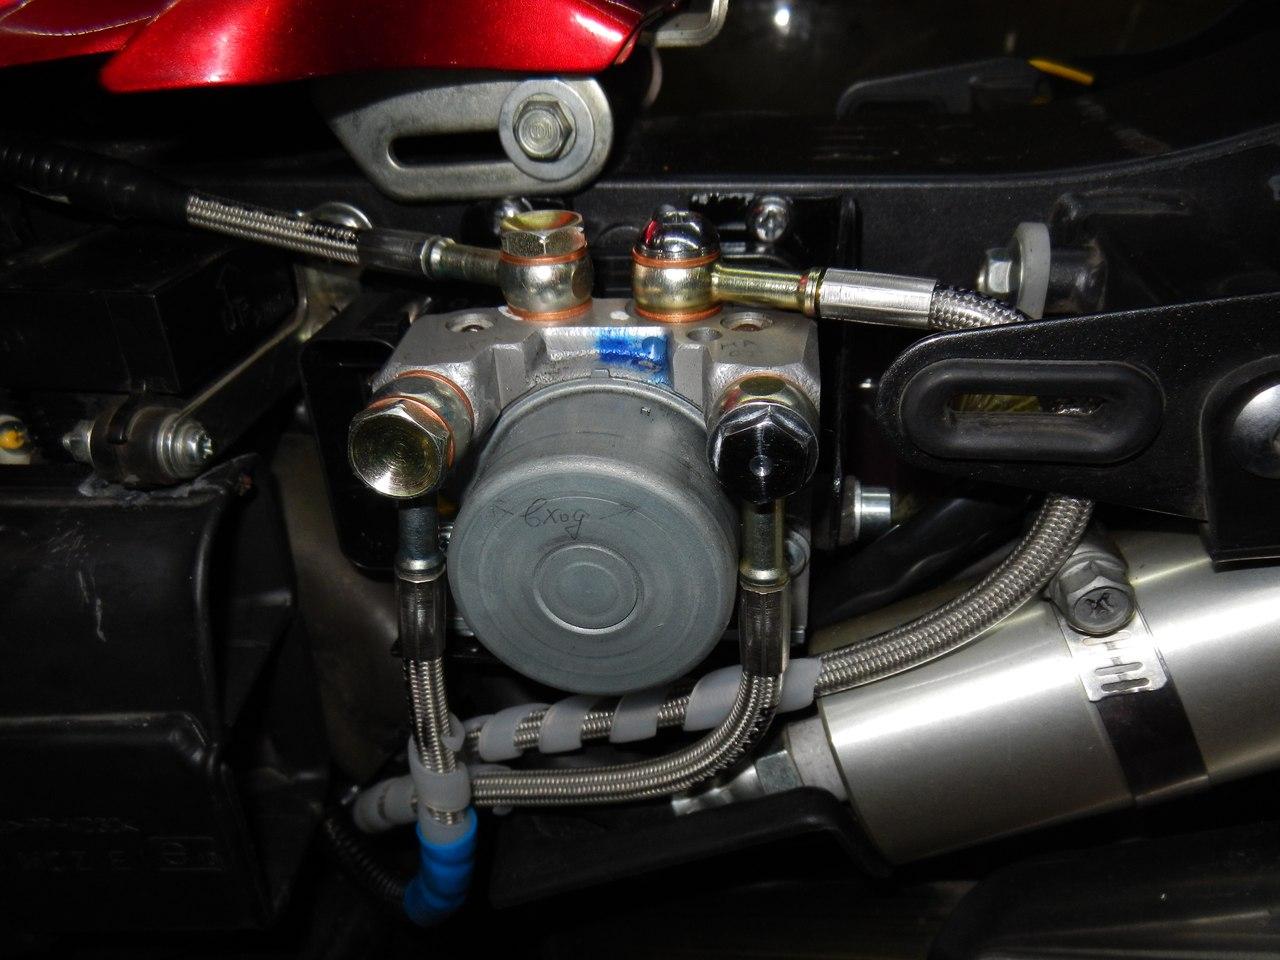 my 919 abs project wrist twisters rh wristtwisters com 2006 Honda Accord Fuse Box Diagram 1995 Honda Accord Fuse Box Diagram